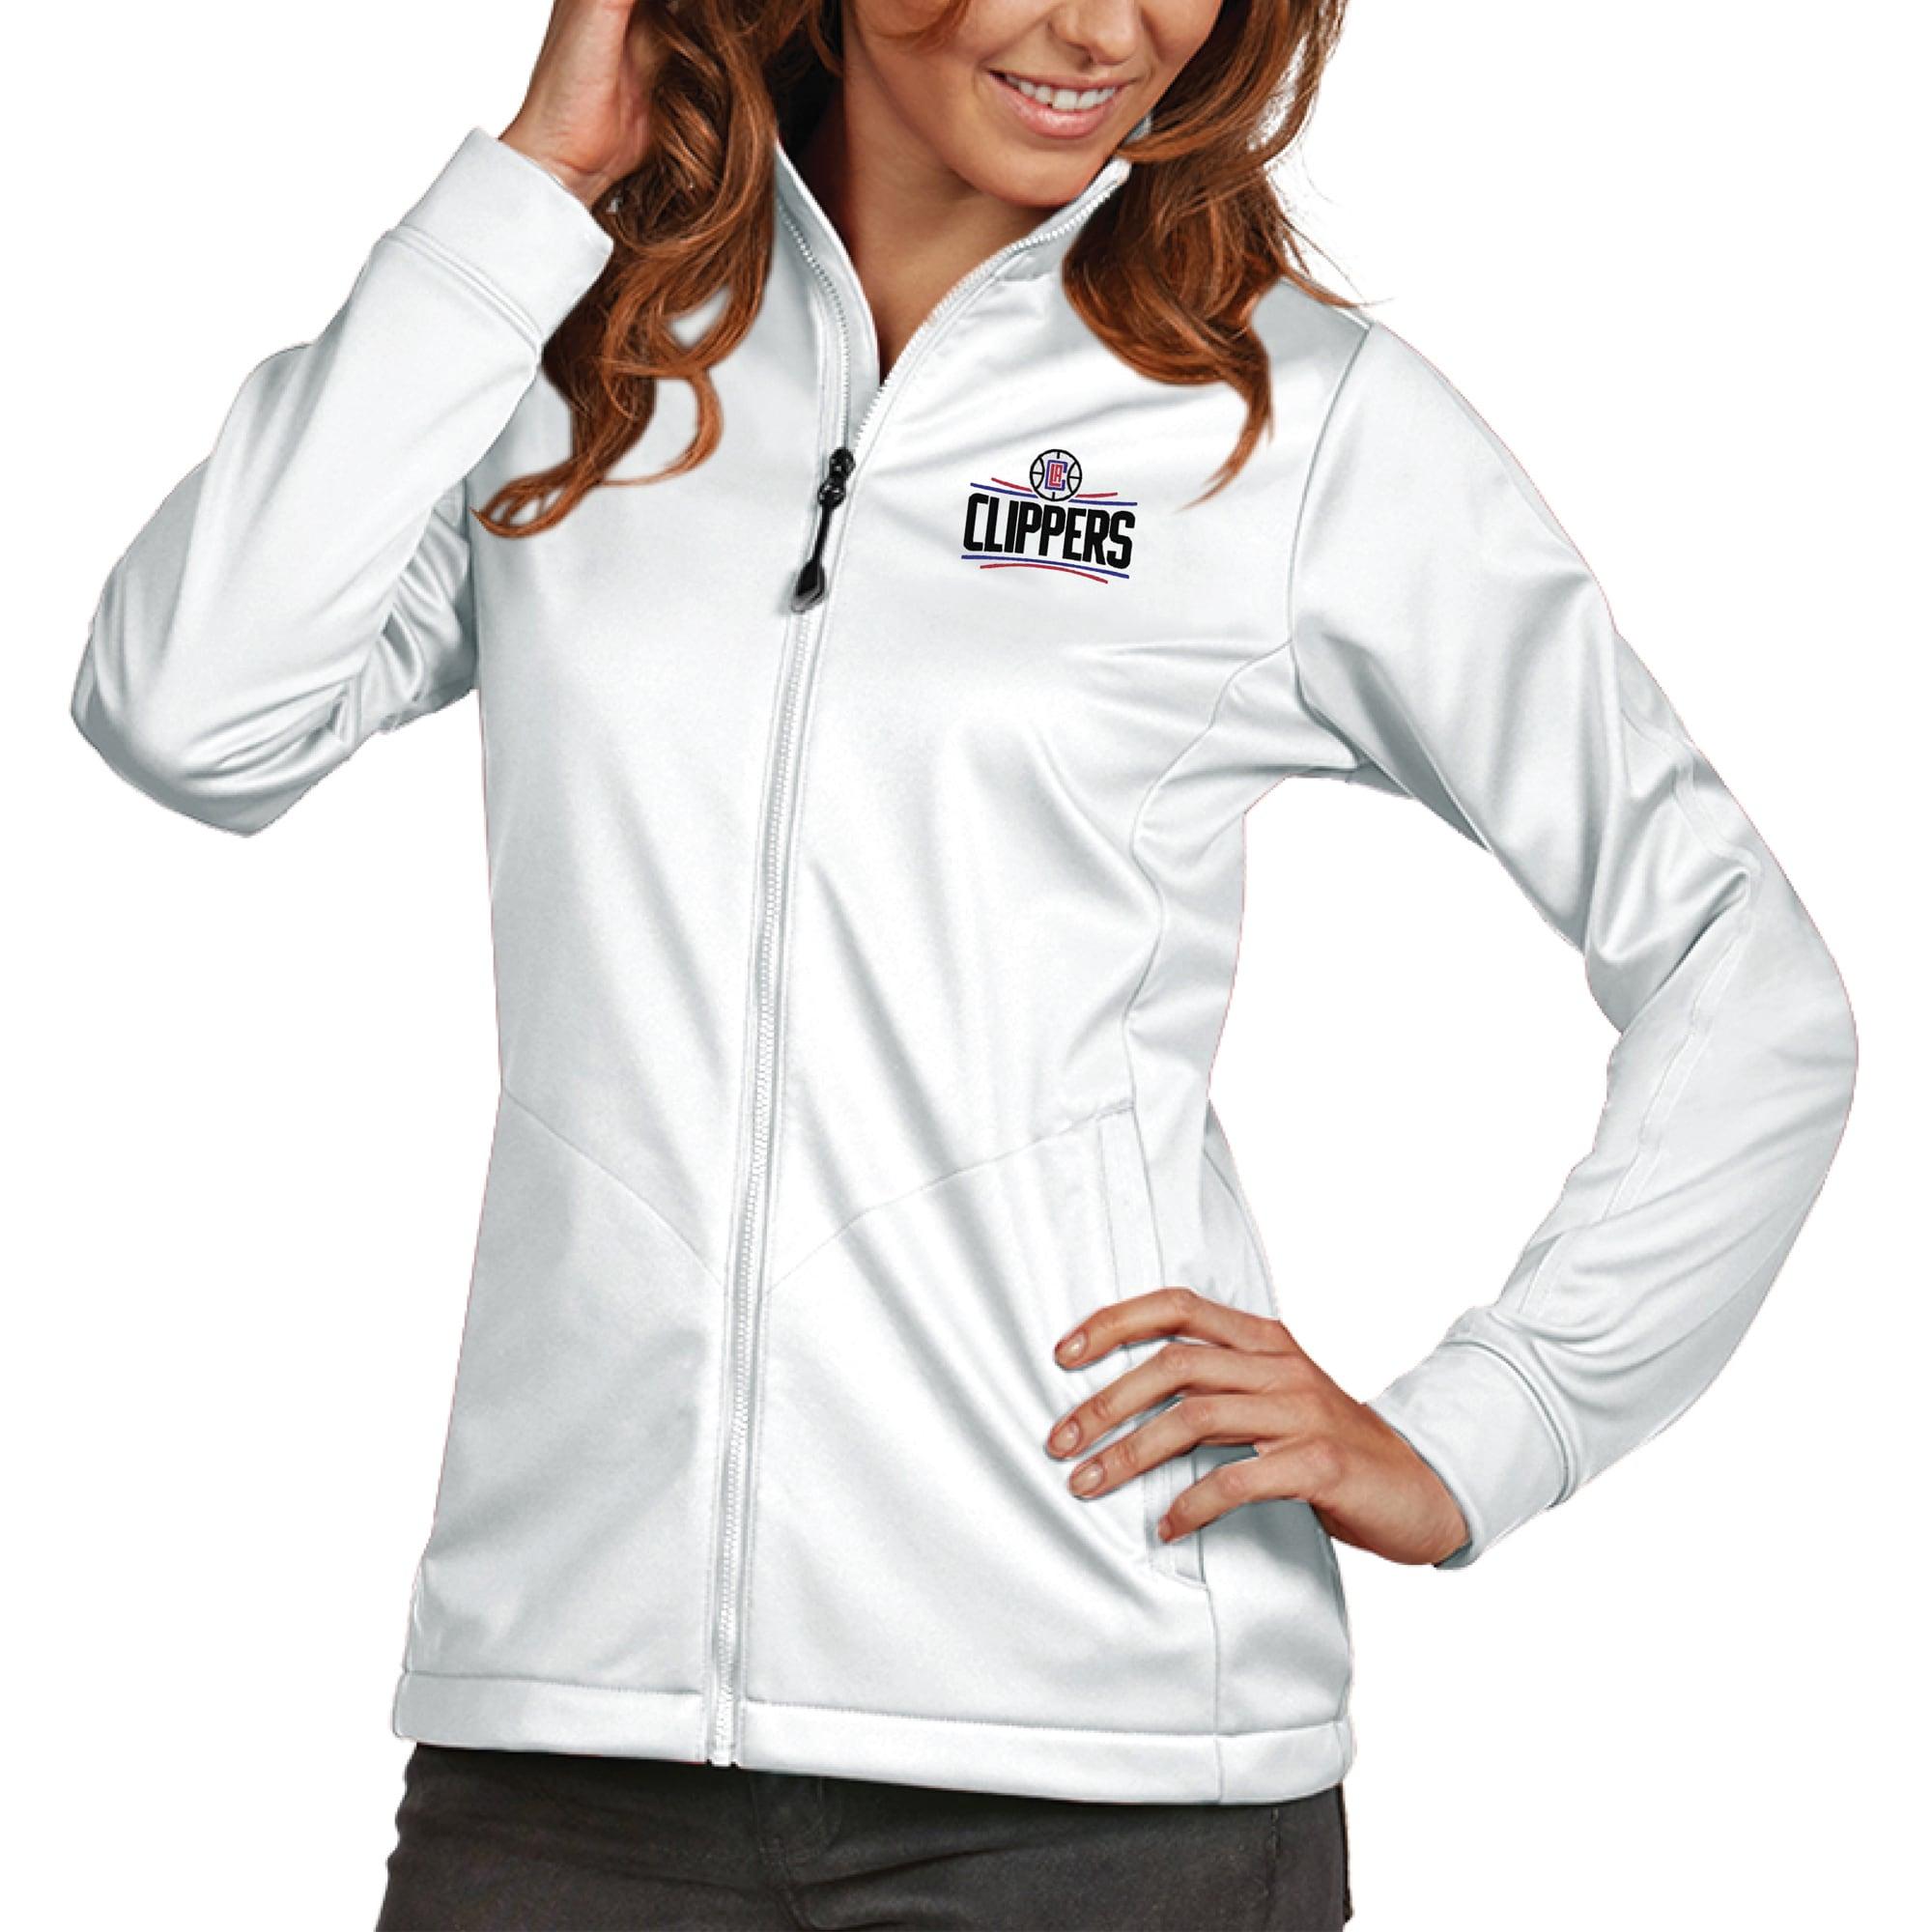 LA Clippers Antigua Women's Golf Full-Zip Jacket - White